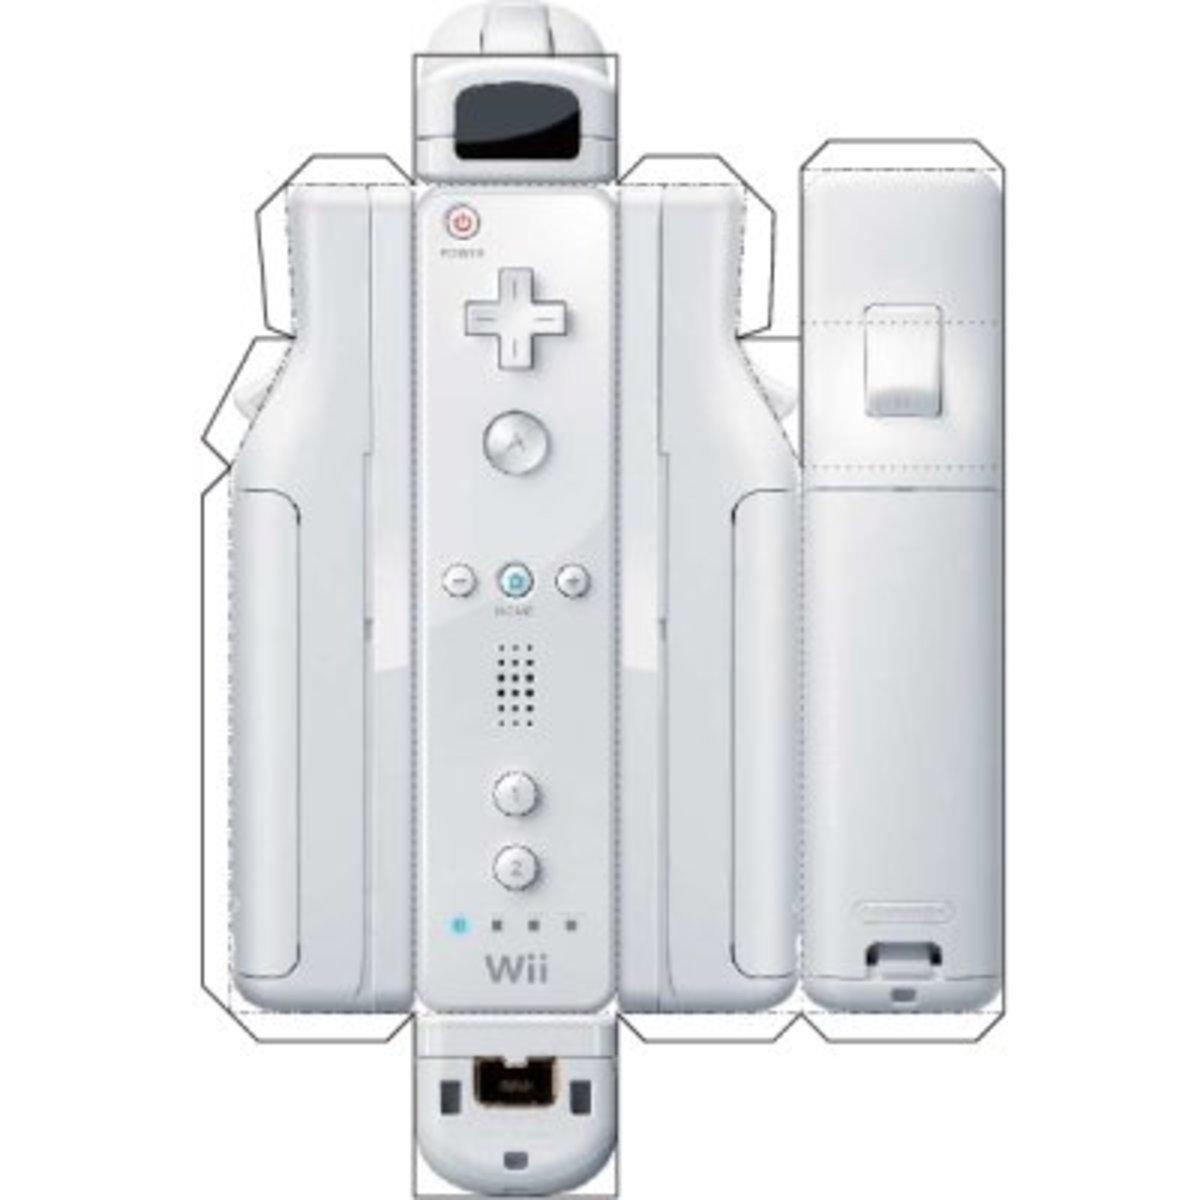 Papercraft Wii controller printable.